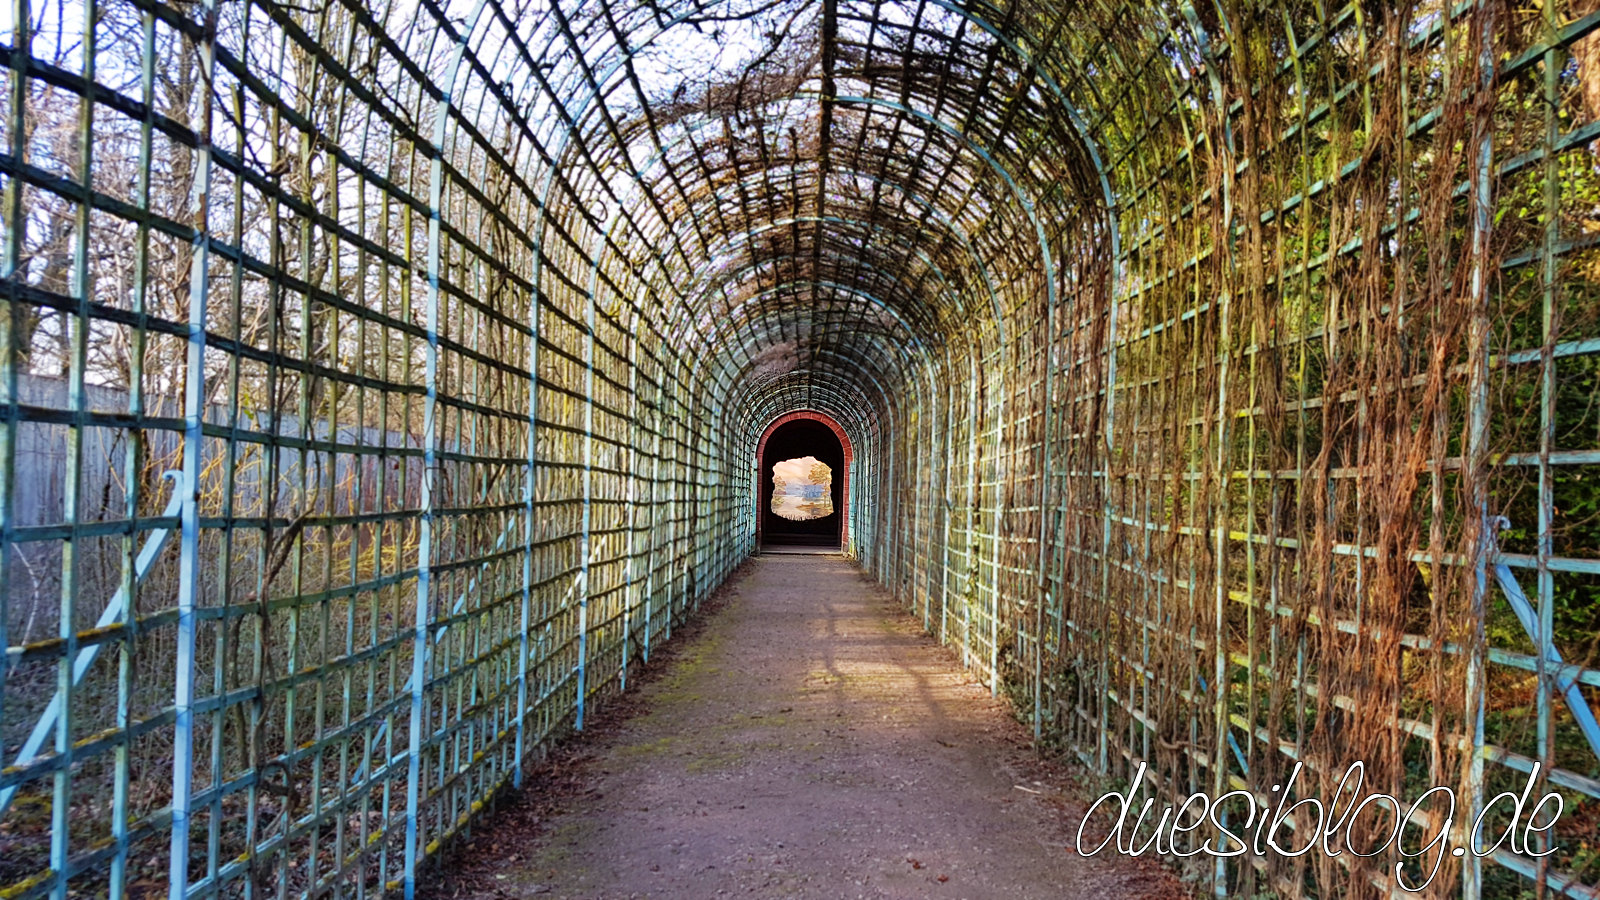 Perspektiv Ende der Welt Schwetzingen Schlosspark duesiblog 01